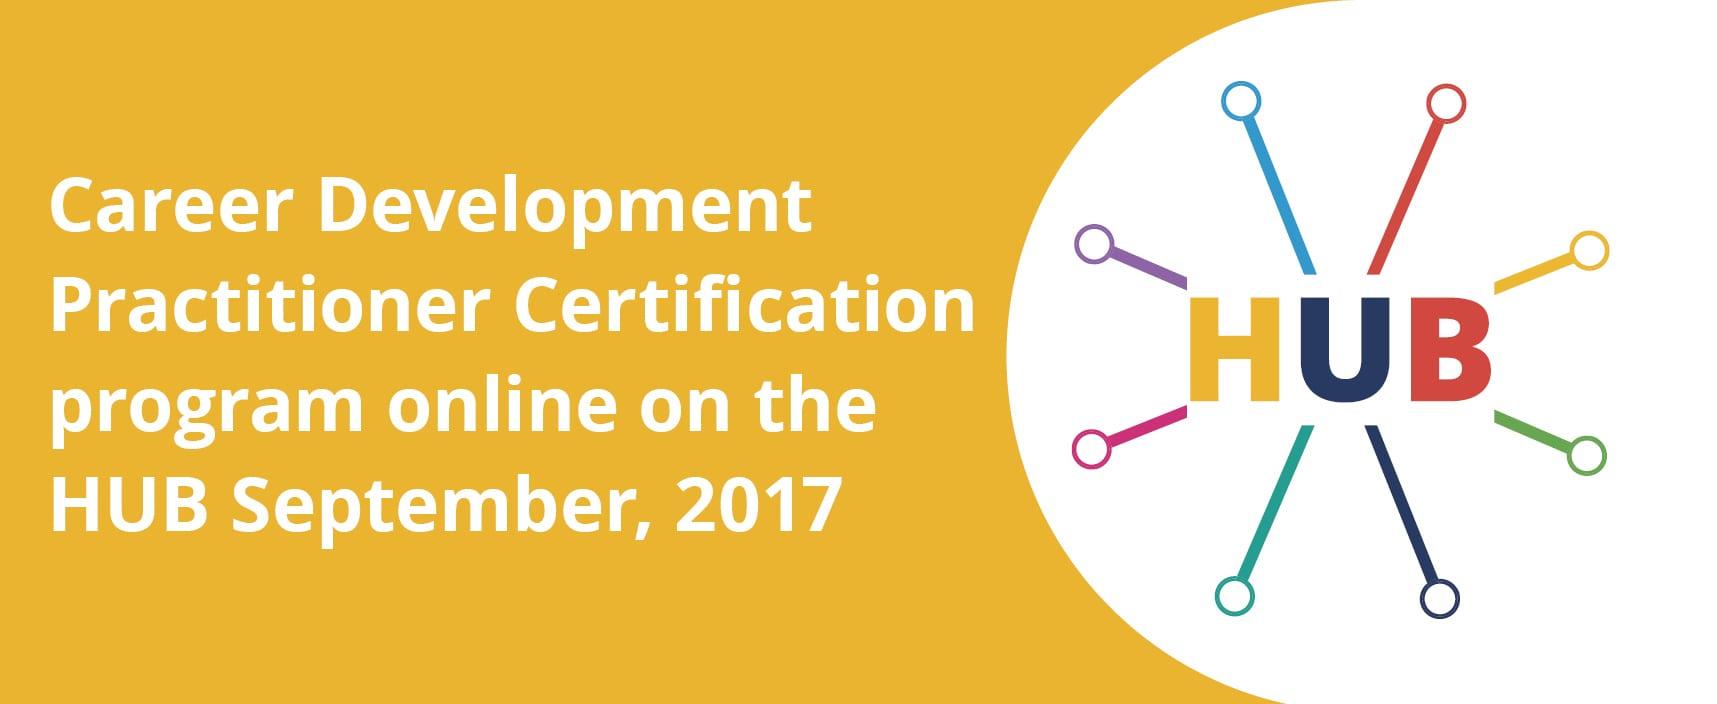 nscda certification ccdp becoming